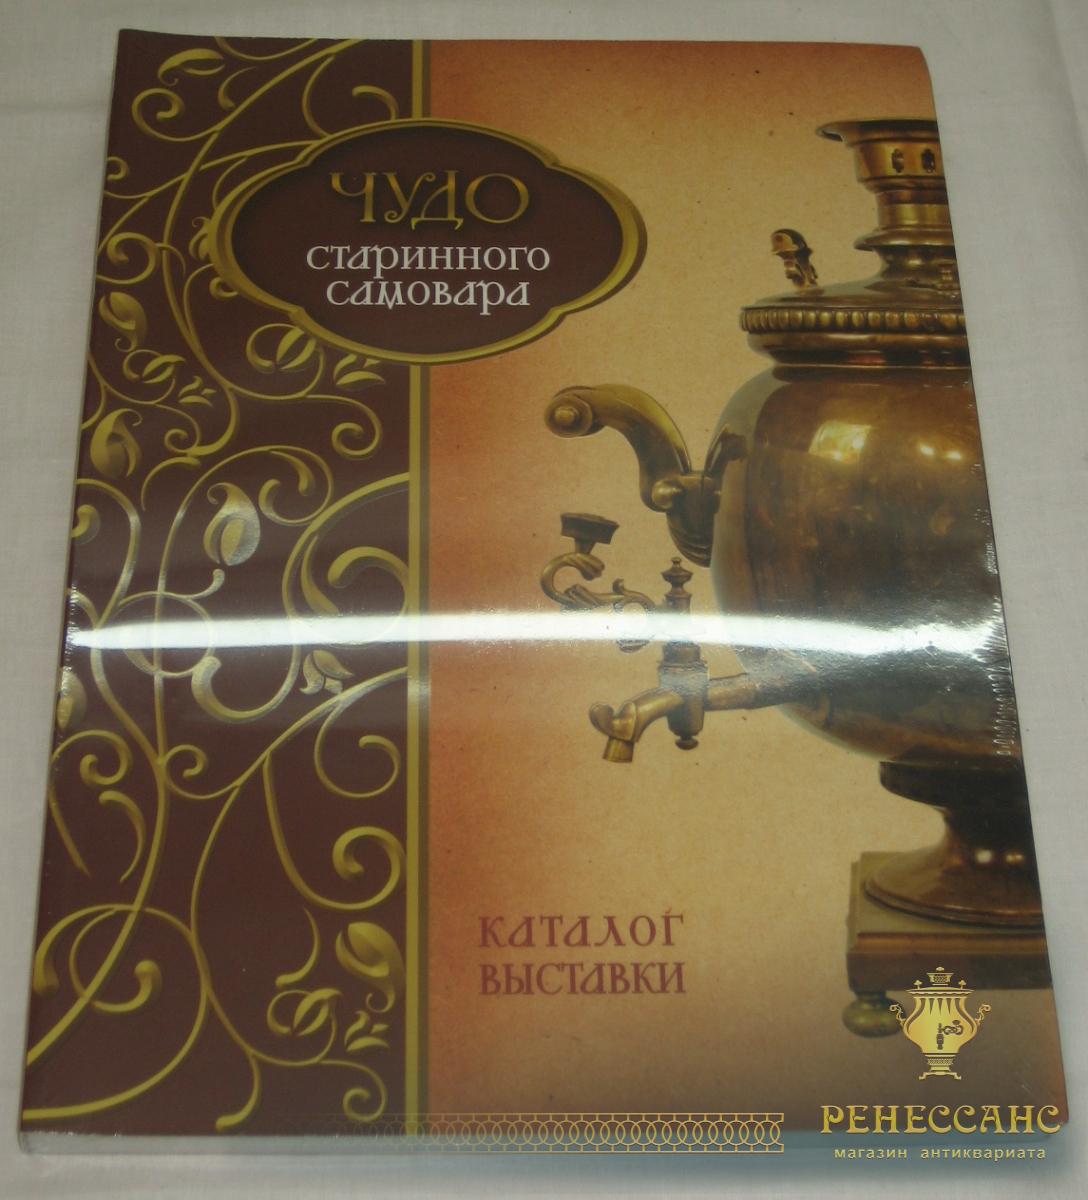 Книга, каталог, «Чудо Старинного Самовара» №1931